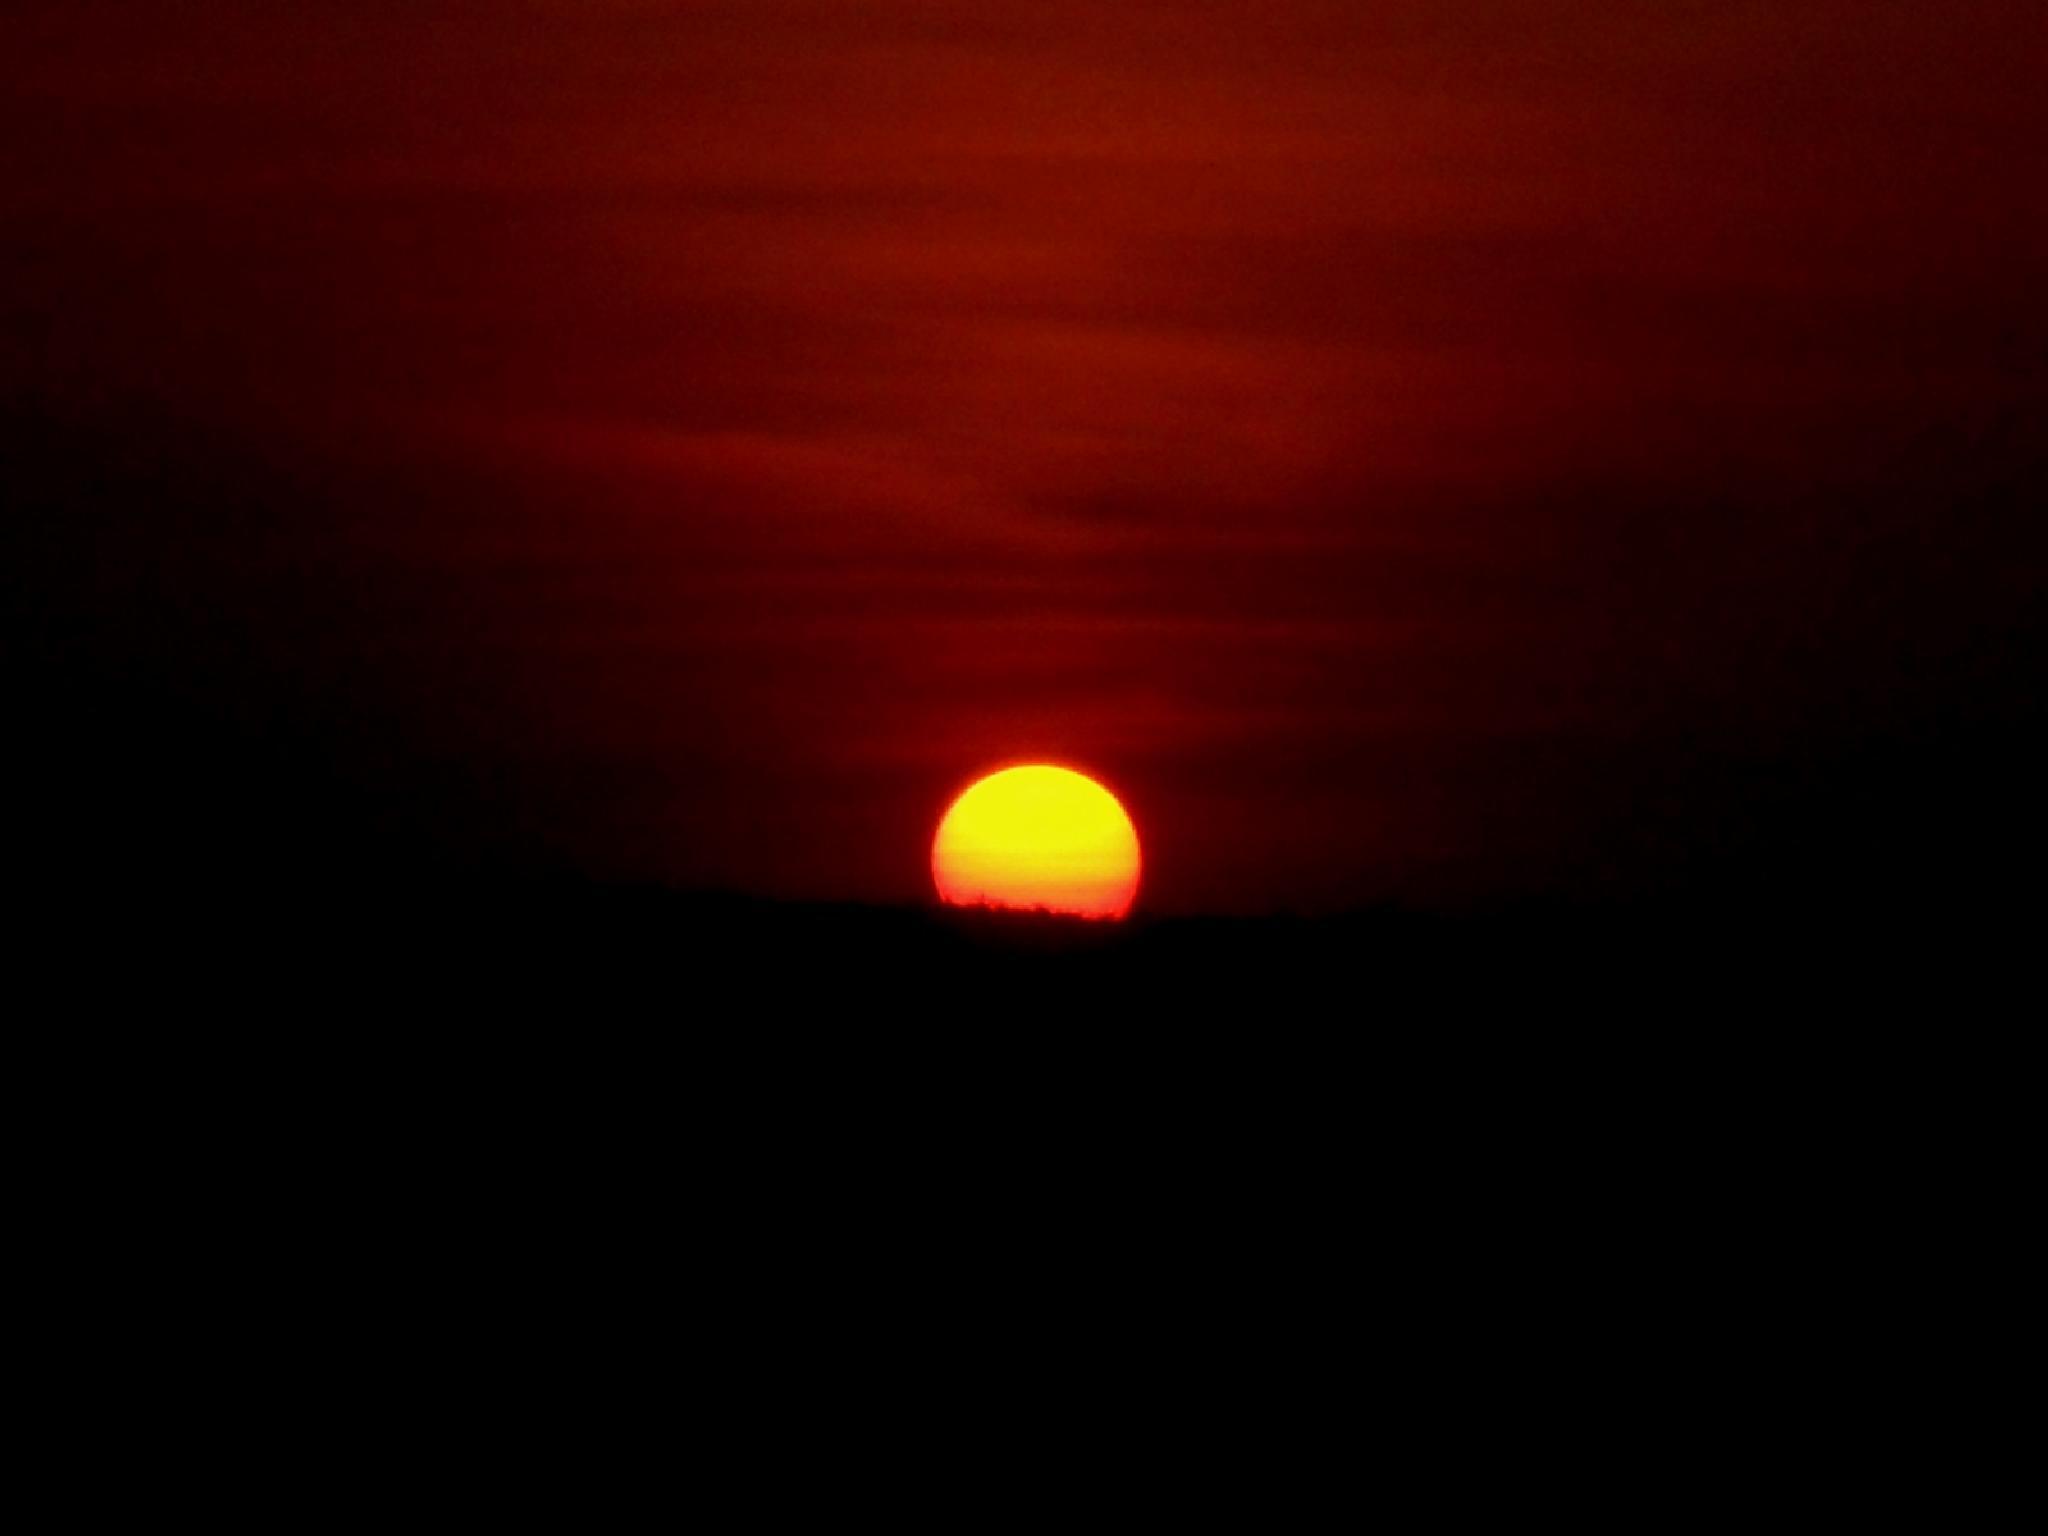 The Mistaken Dawn by Abhishek Ghosh